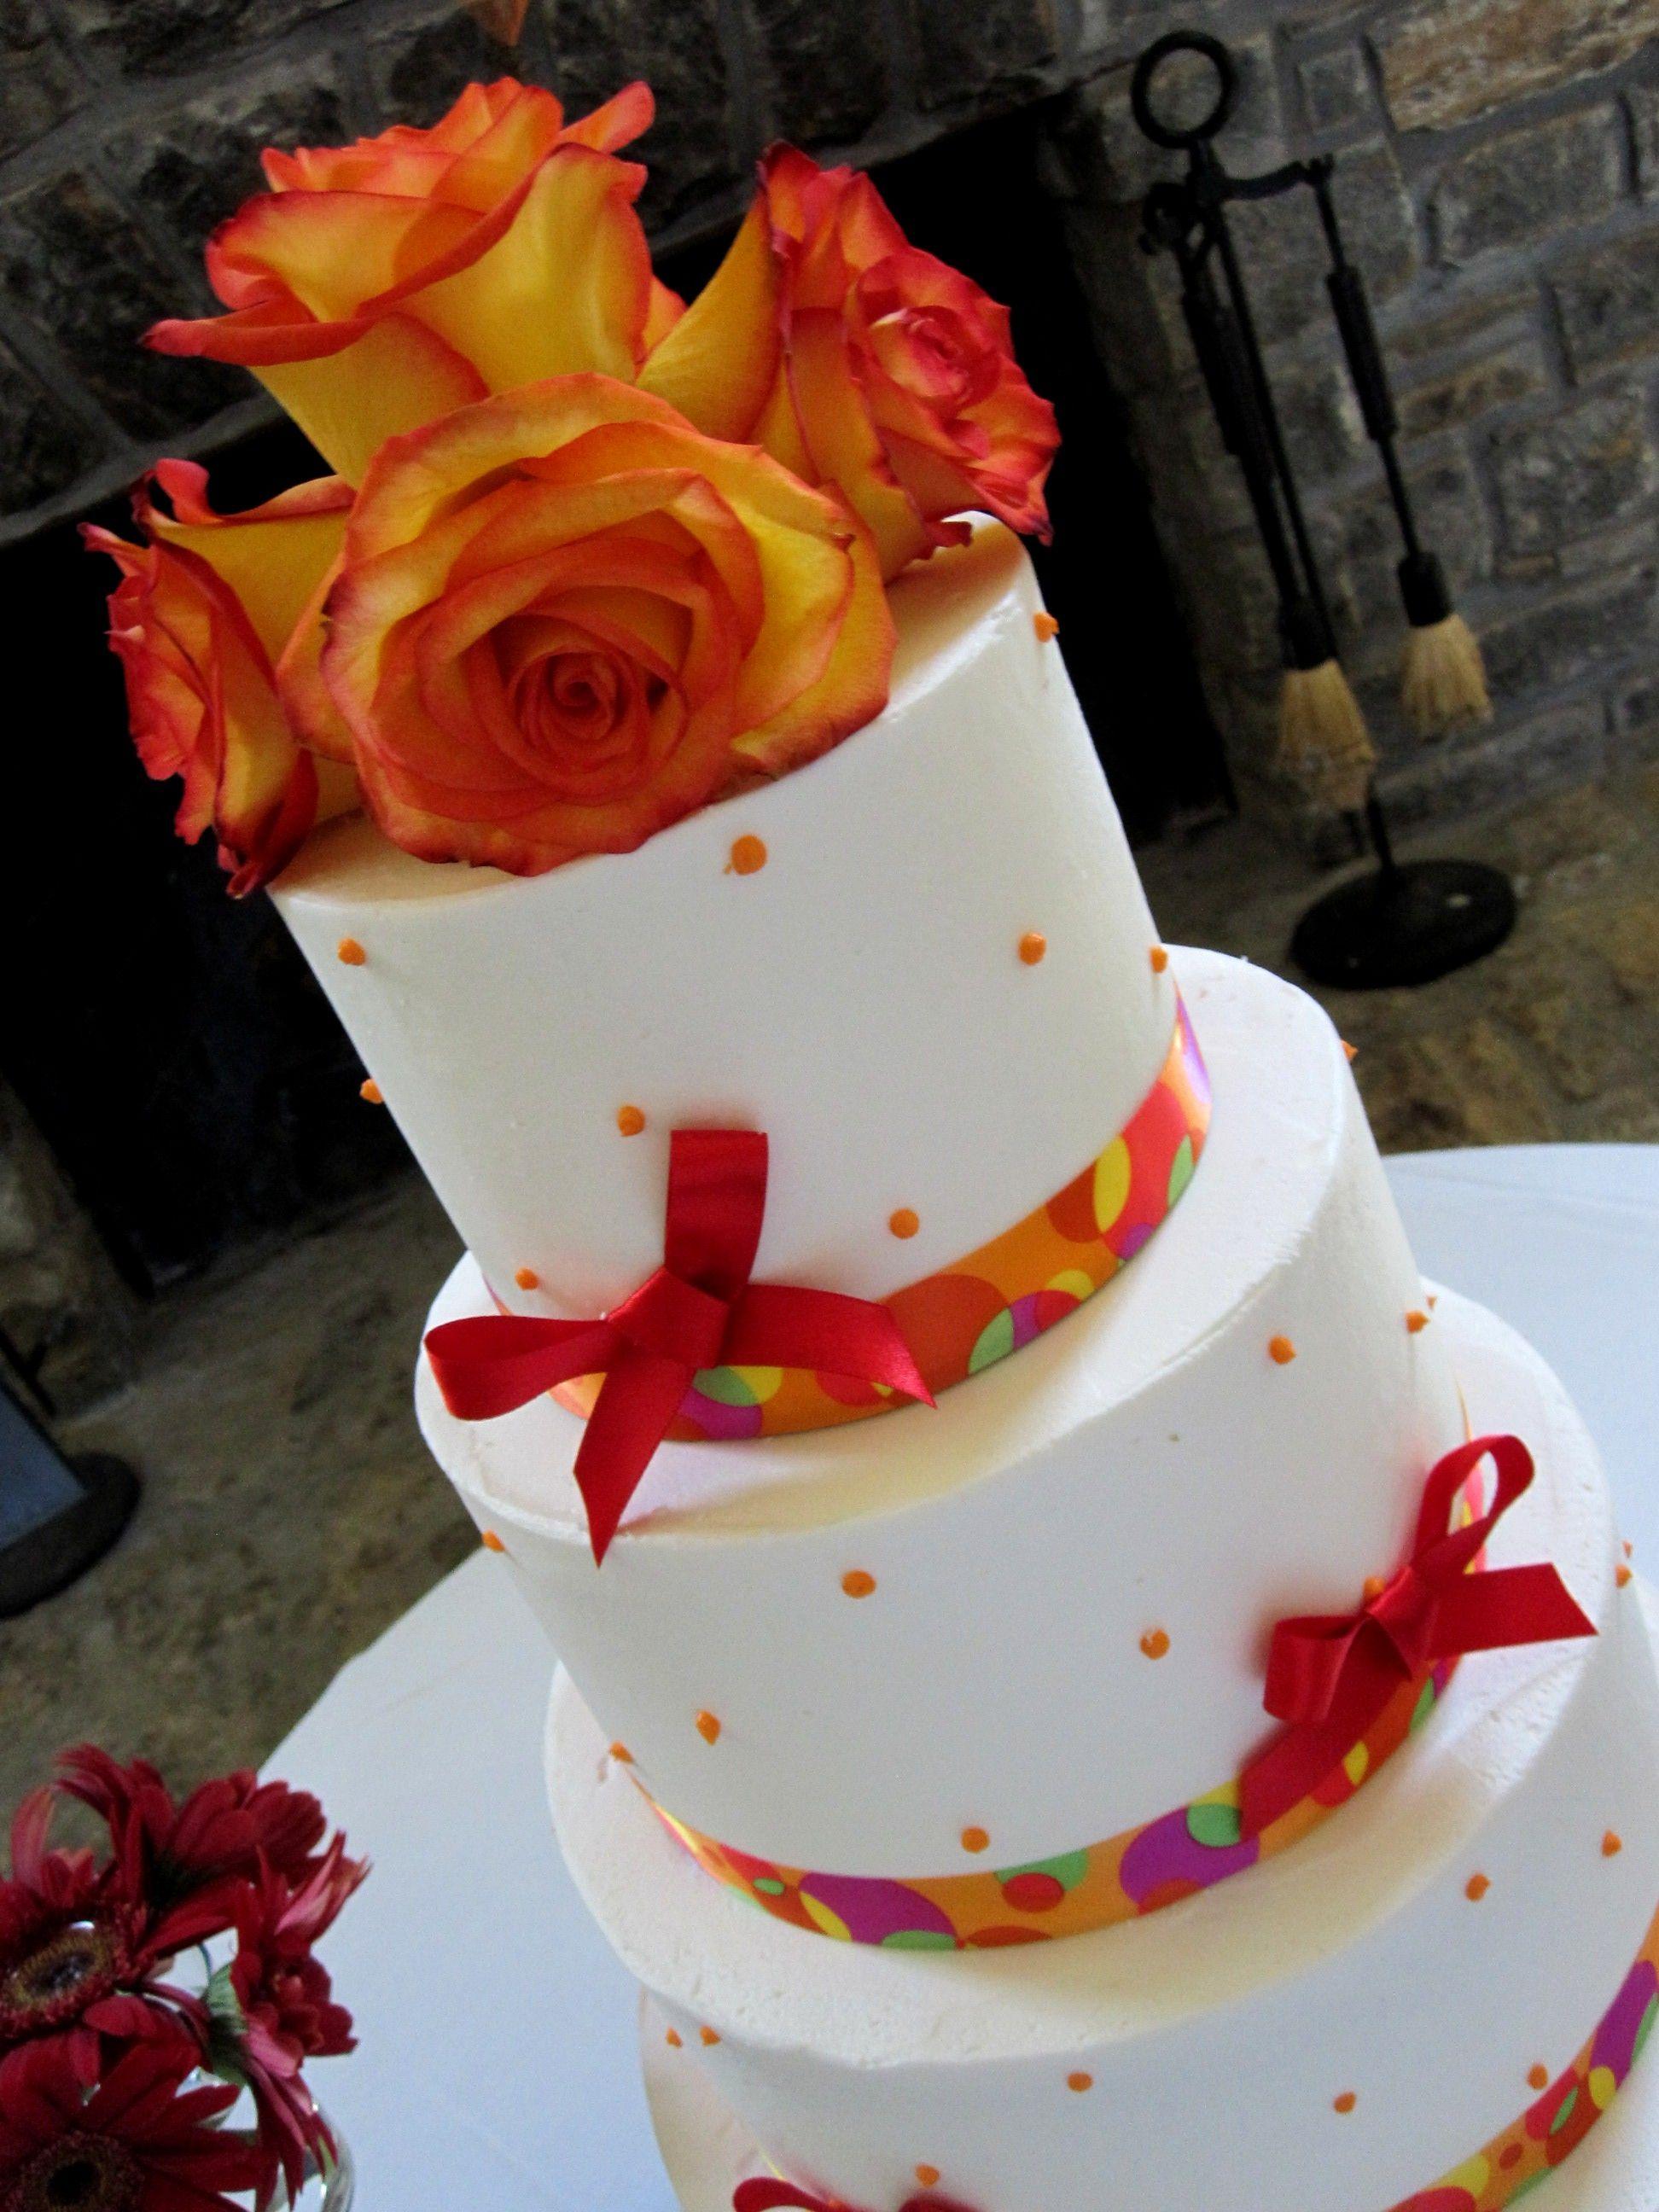 Wedding Cake Buttercream Orange, Red and Yellow The